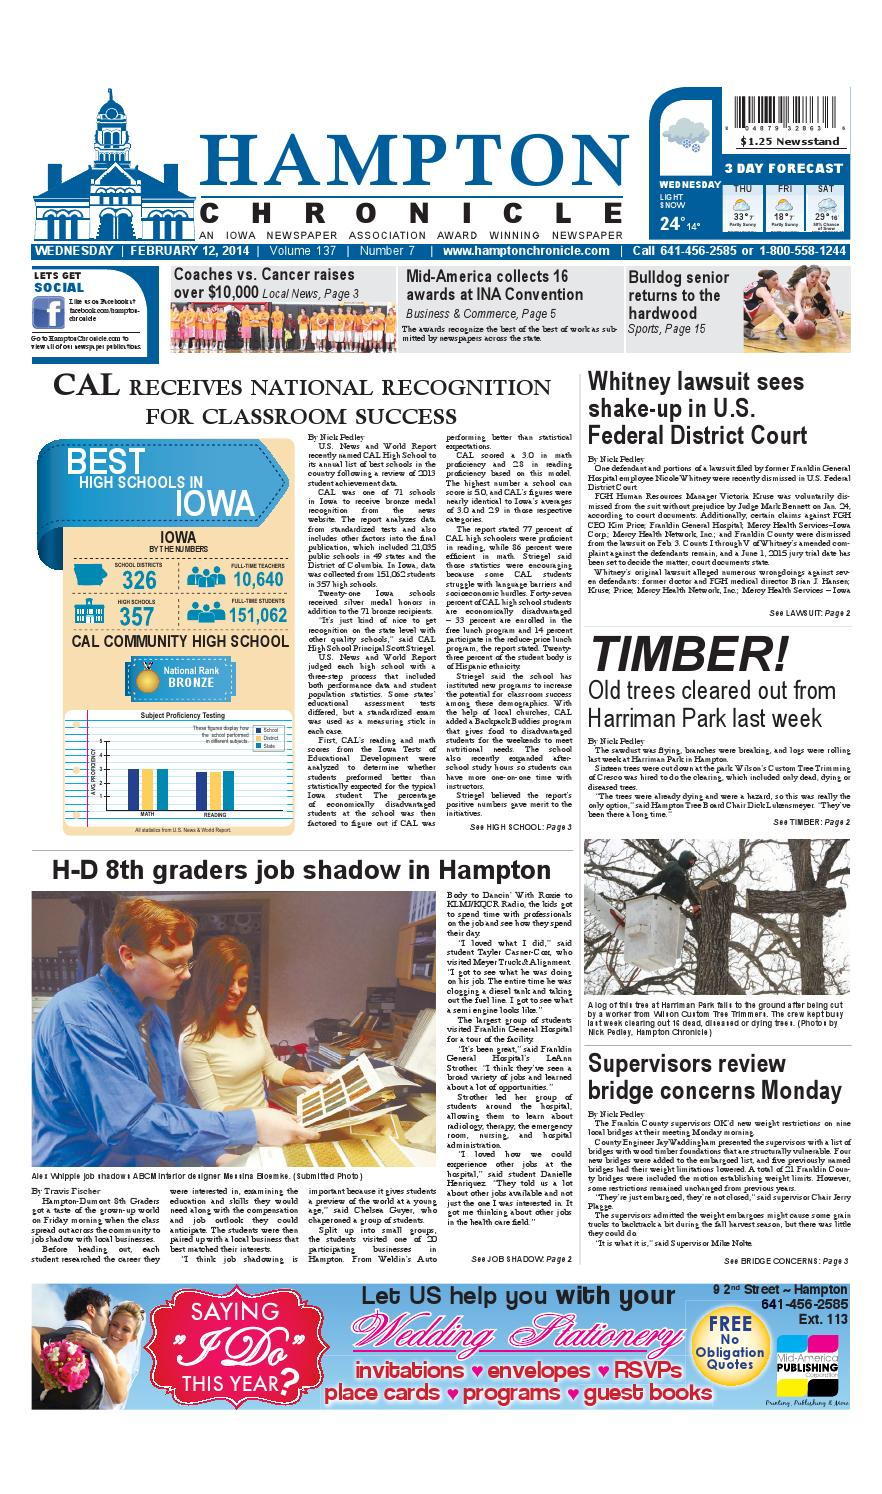 Hampton chronicle february 12 2014 by mid america publishing hampton chronicle february 12 2014 by mid america publishing corporation issuu fandeluxe Gallery